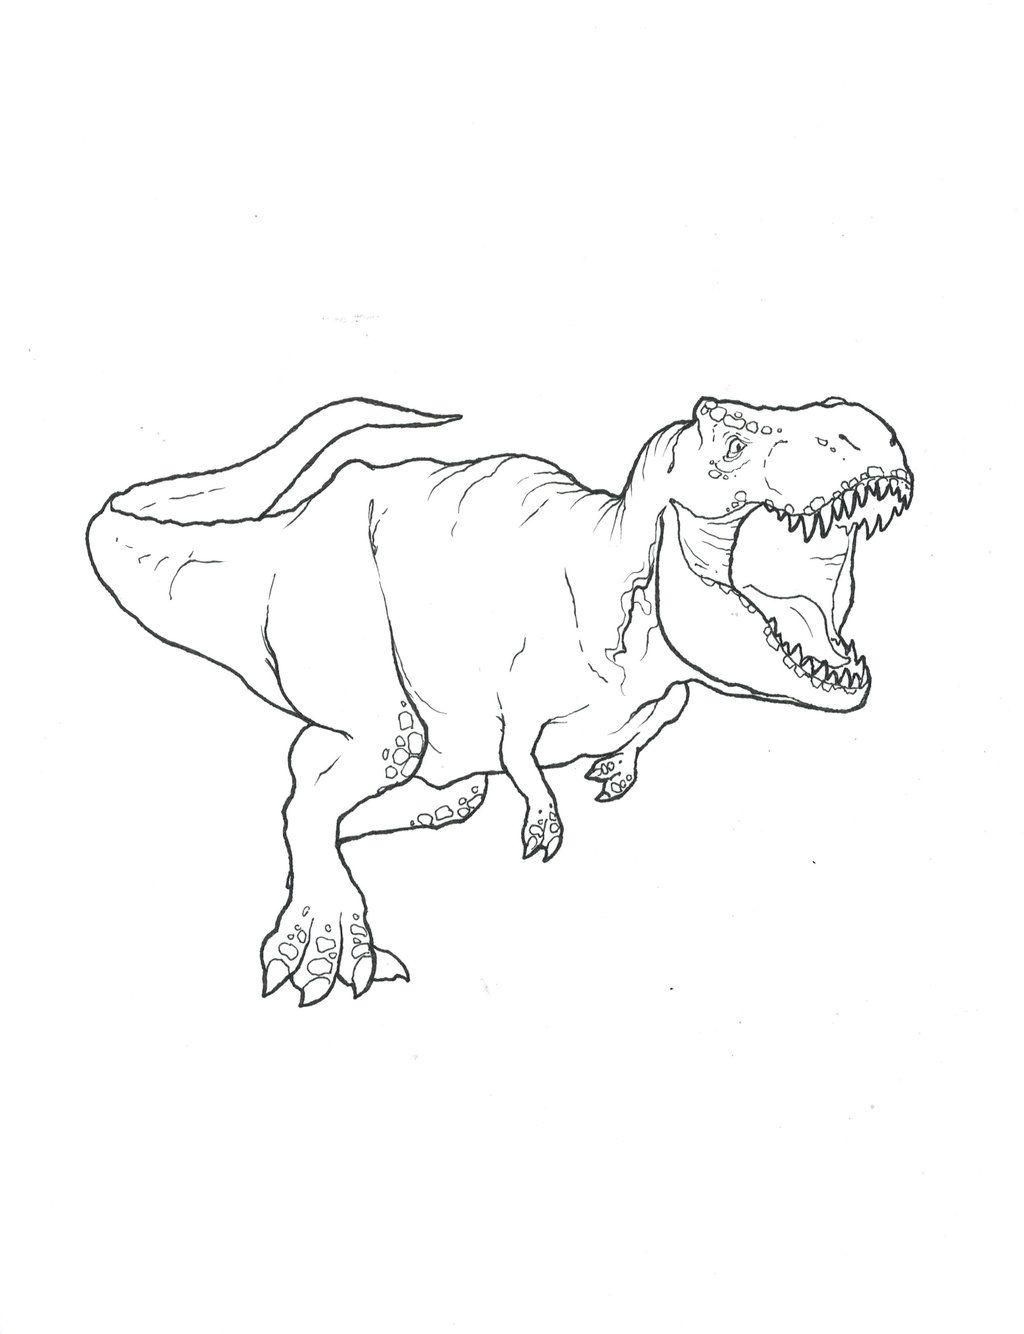 Tyrannosaurus Rex Coloring Page